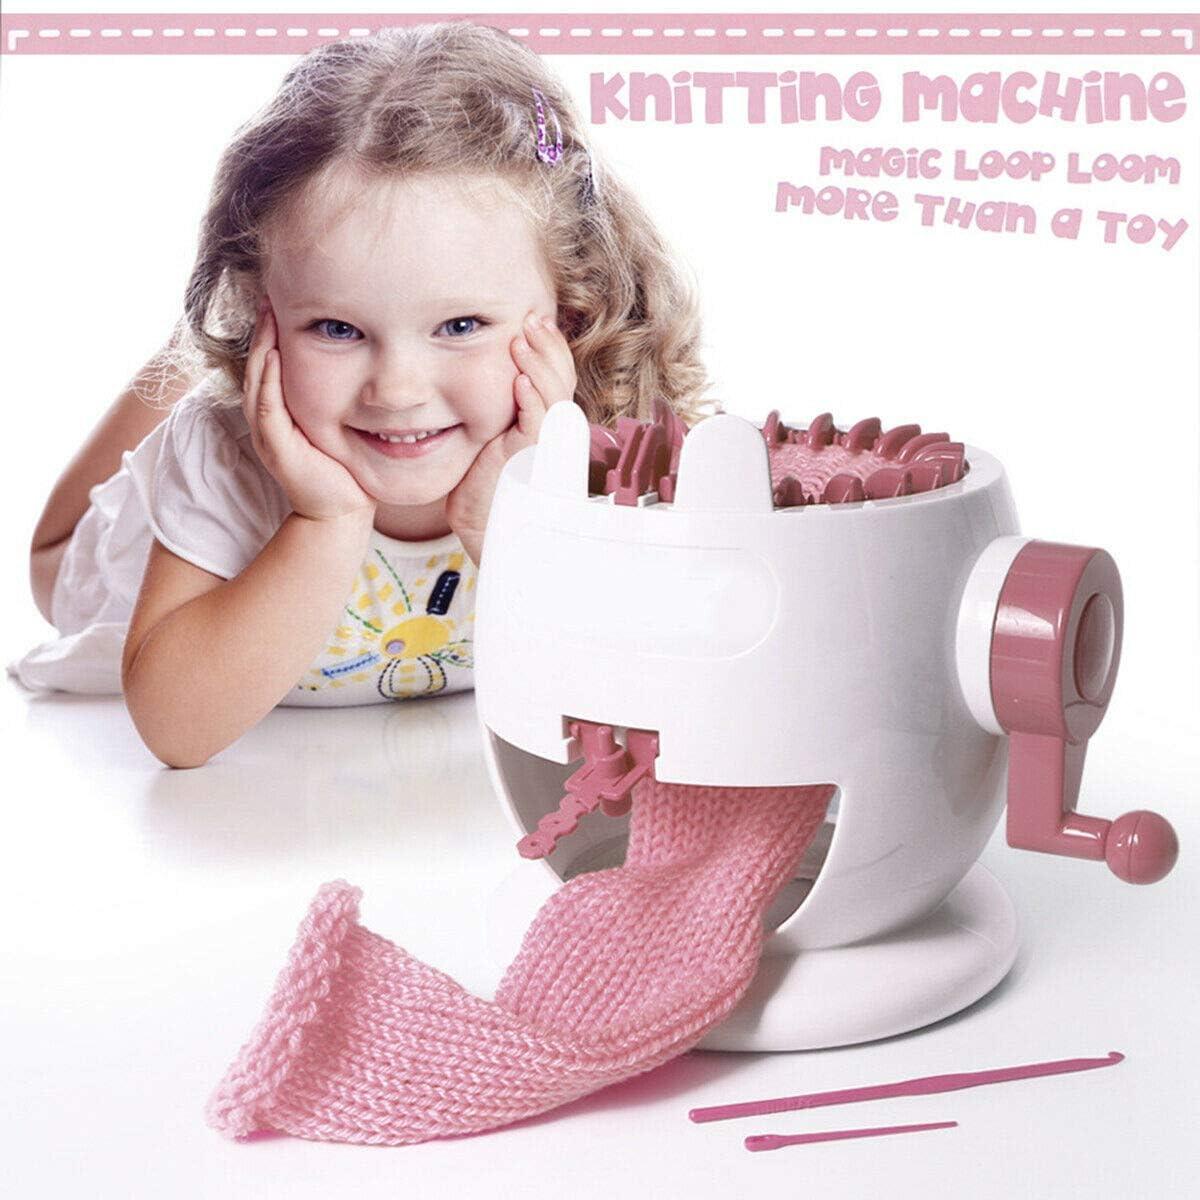 YOMENG Portable Needle Hand Knitting Machine Portable Smart Weaver Knitting Round Loom Educational Toys